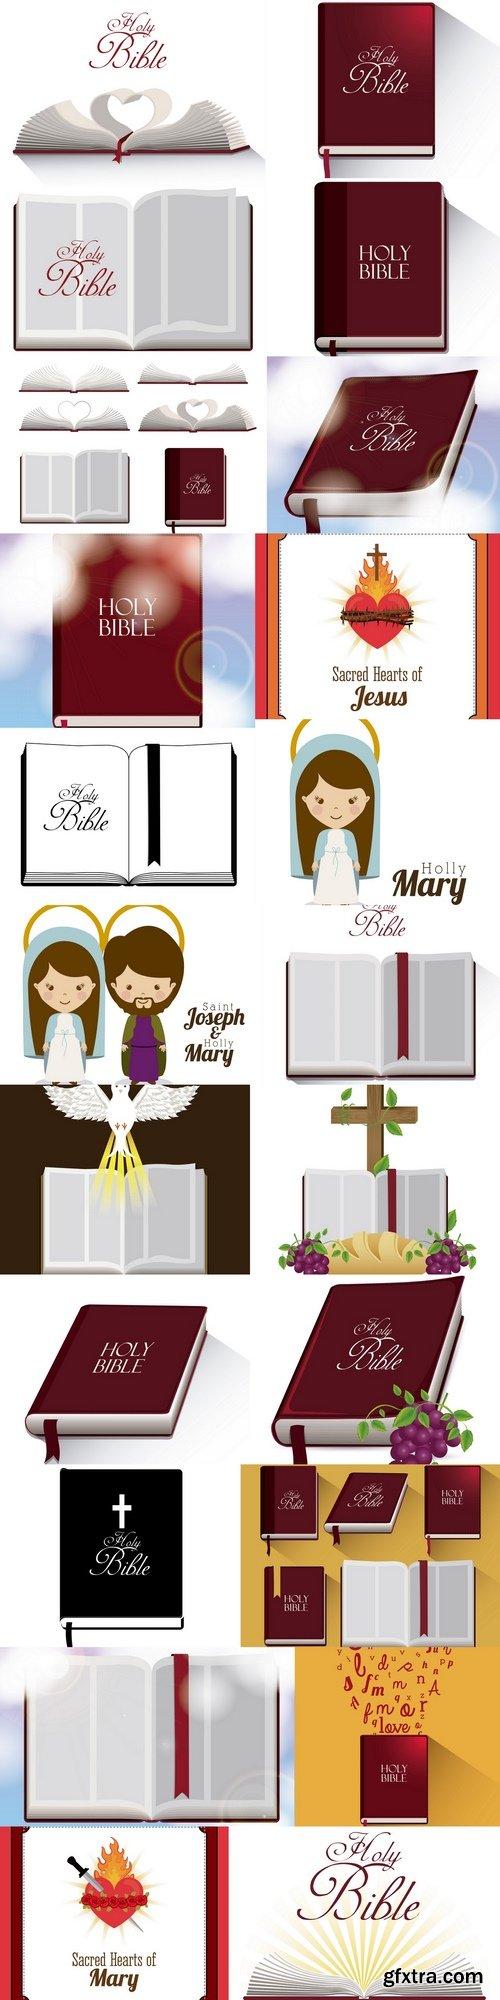 Christianity design 2